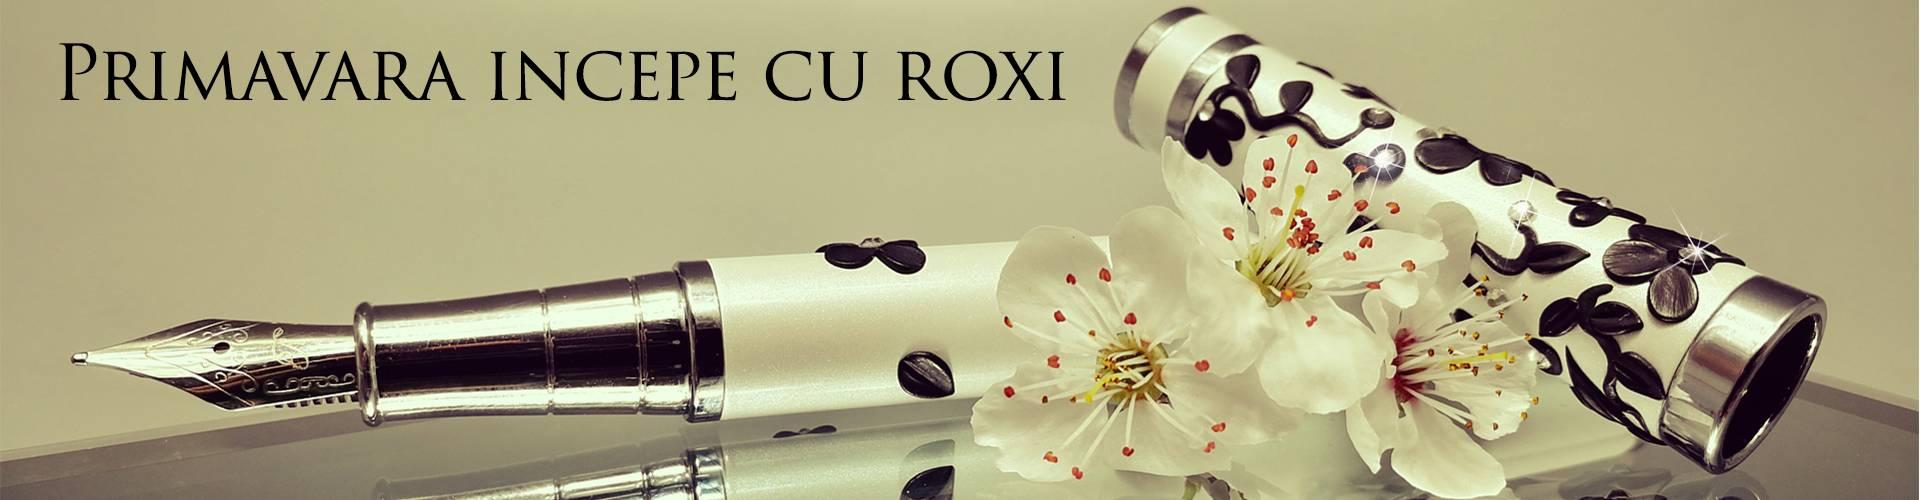 Roller Roxi